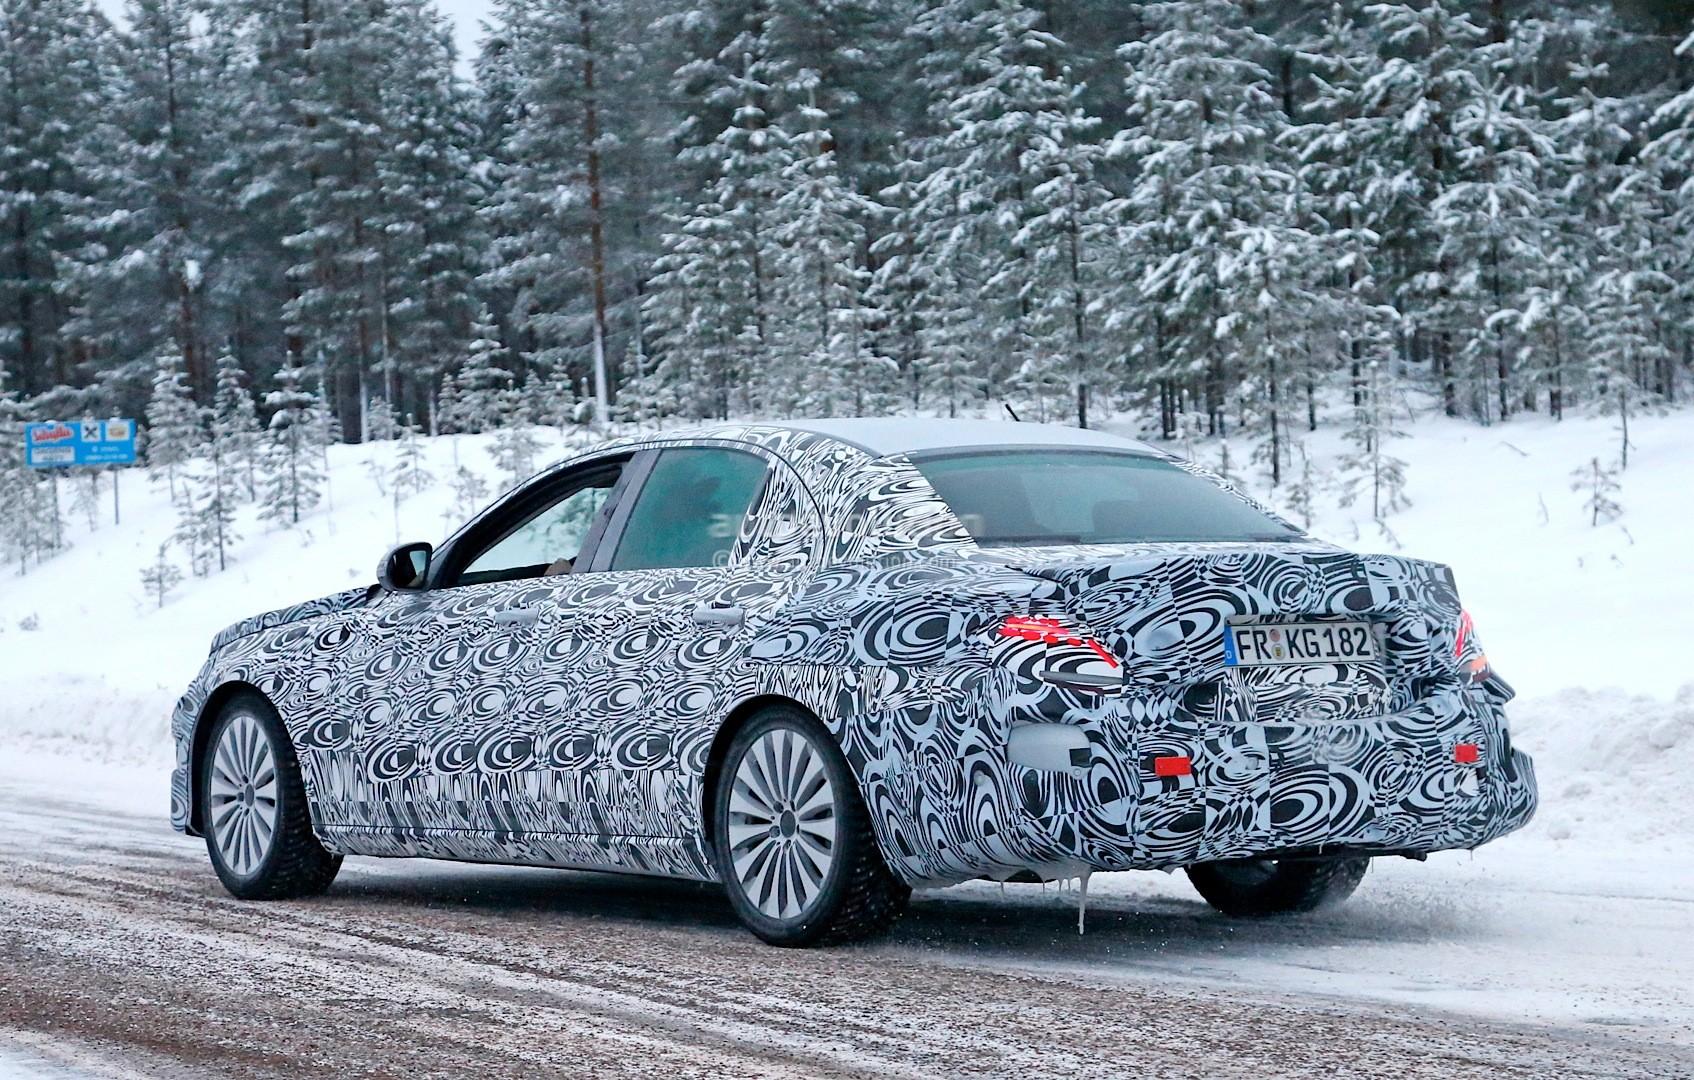 Spyshots 2016 W213 Mercedes E Class Plug In Hybrid First